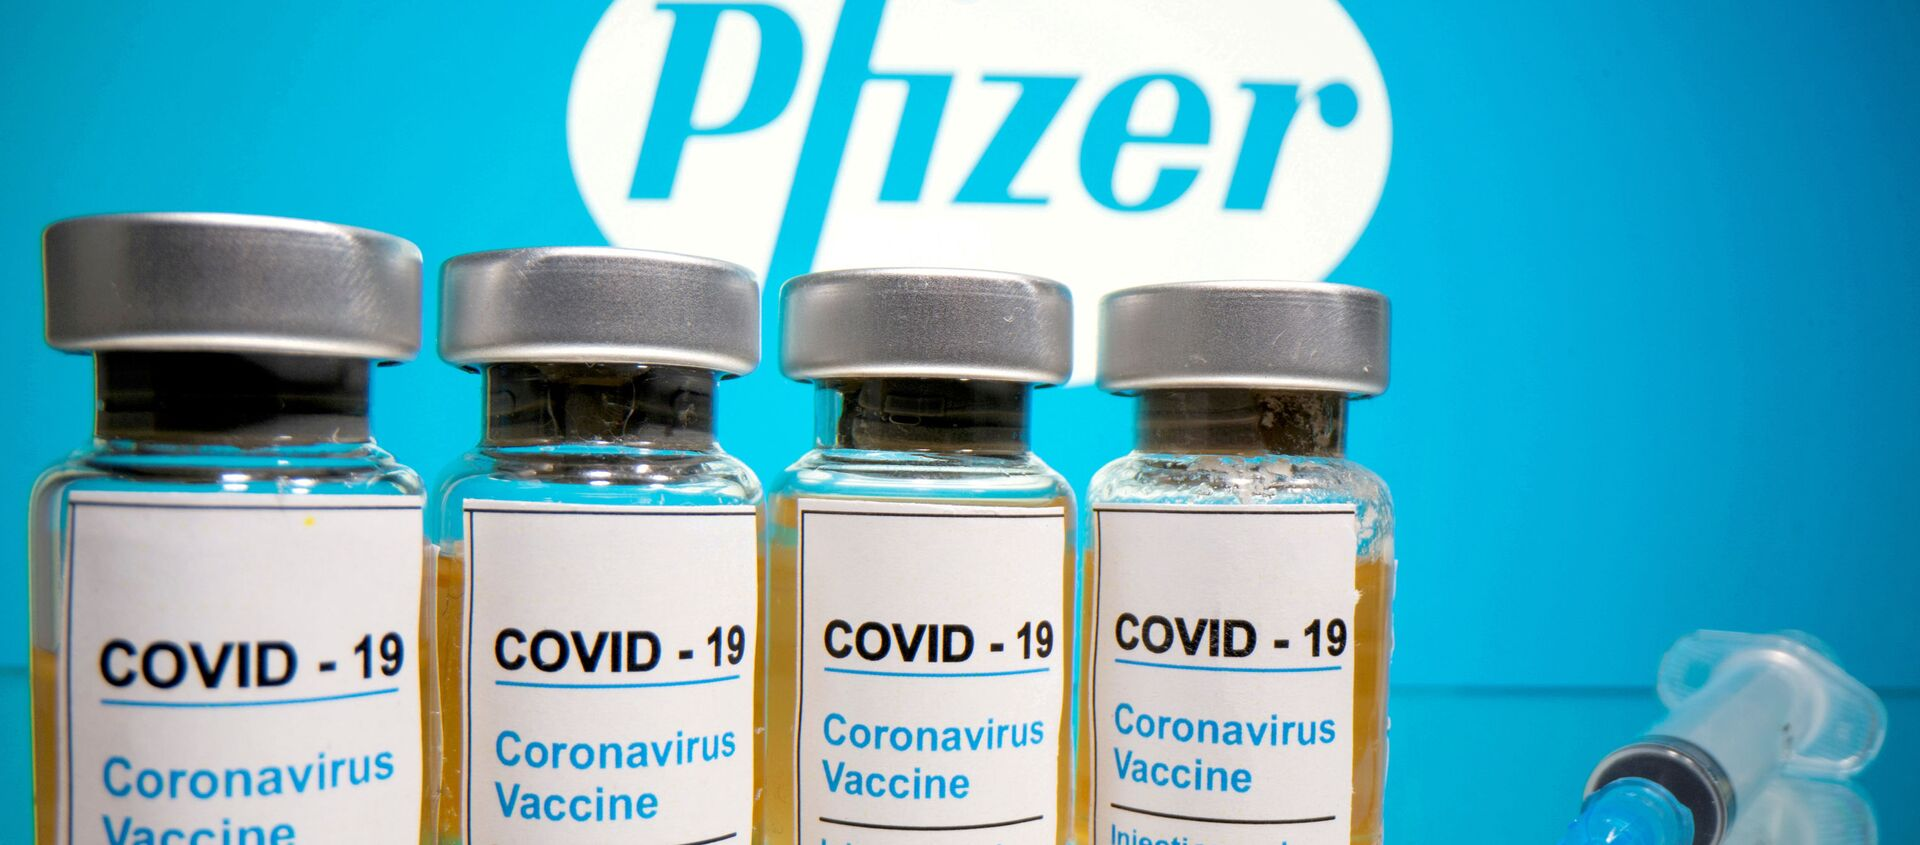 Vaccino Pfizer - Sputnik Italia, 1920, 30.12.2020